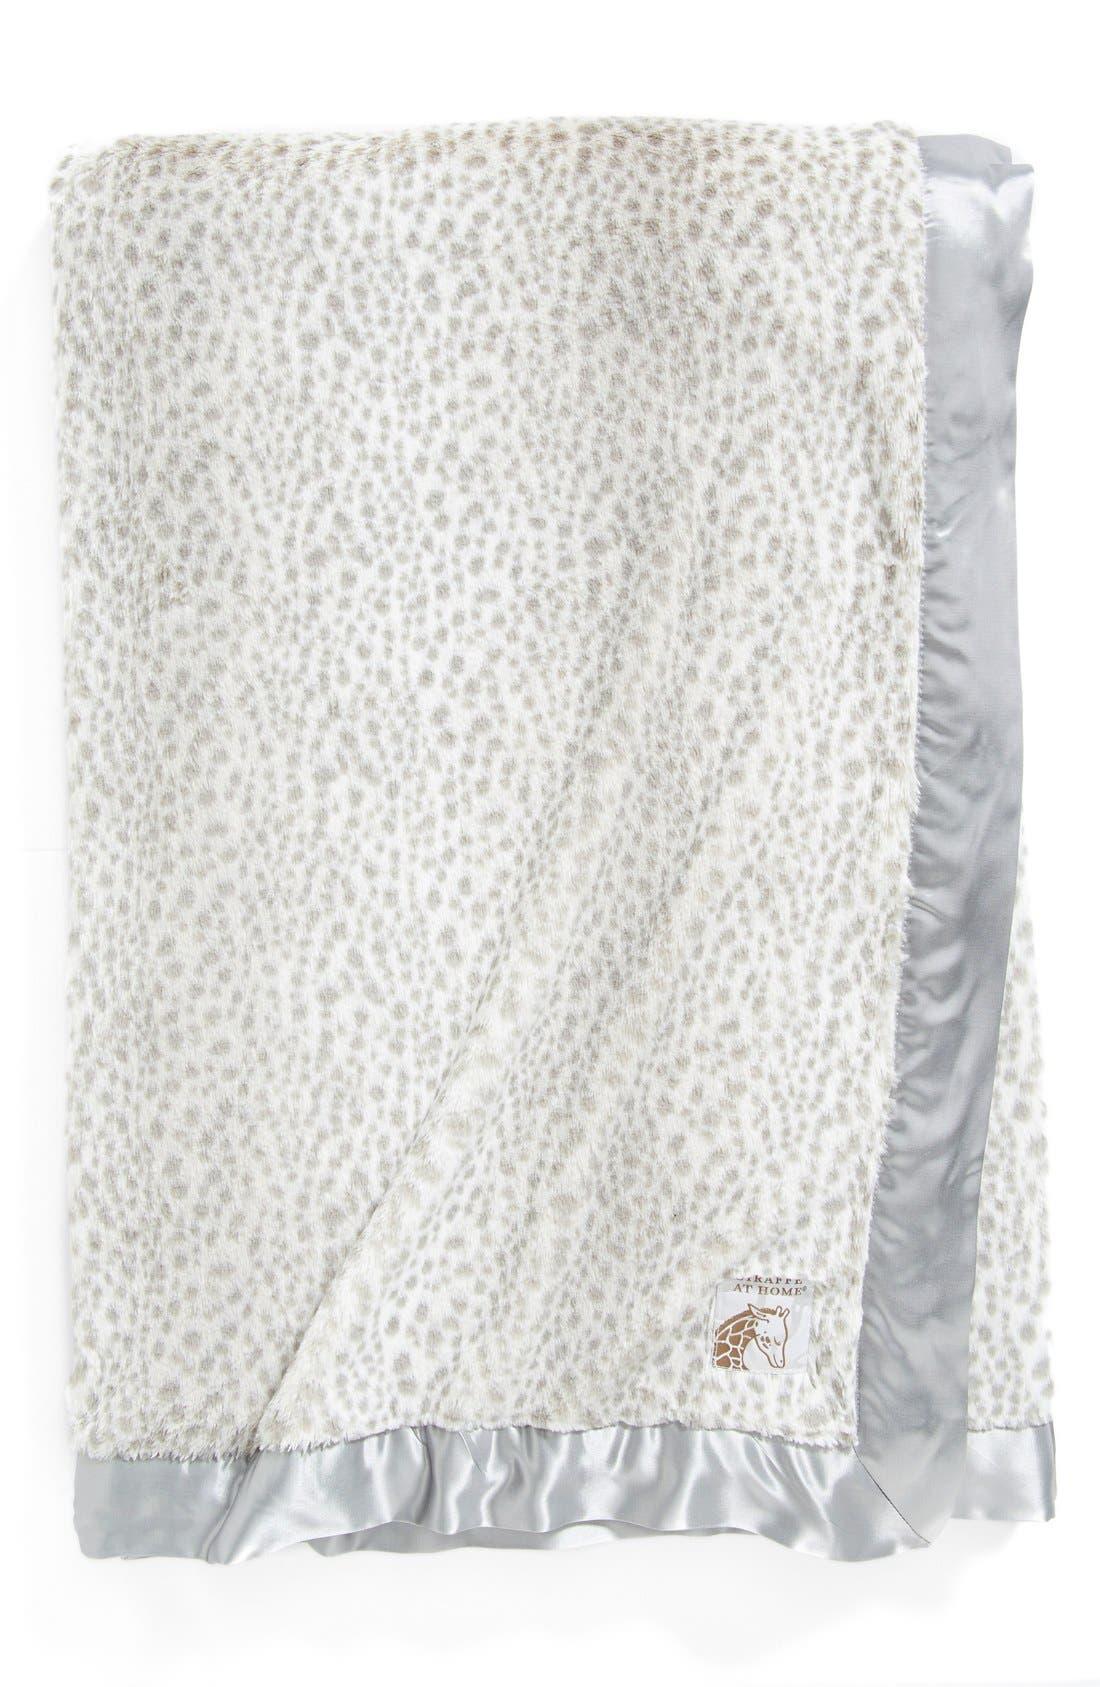 'Luxe Snow Leopard - Double' Faux Fur Throw,                             Main thumbnail 1, color,                             Silver